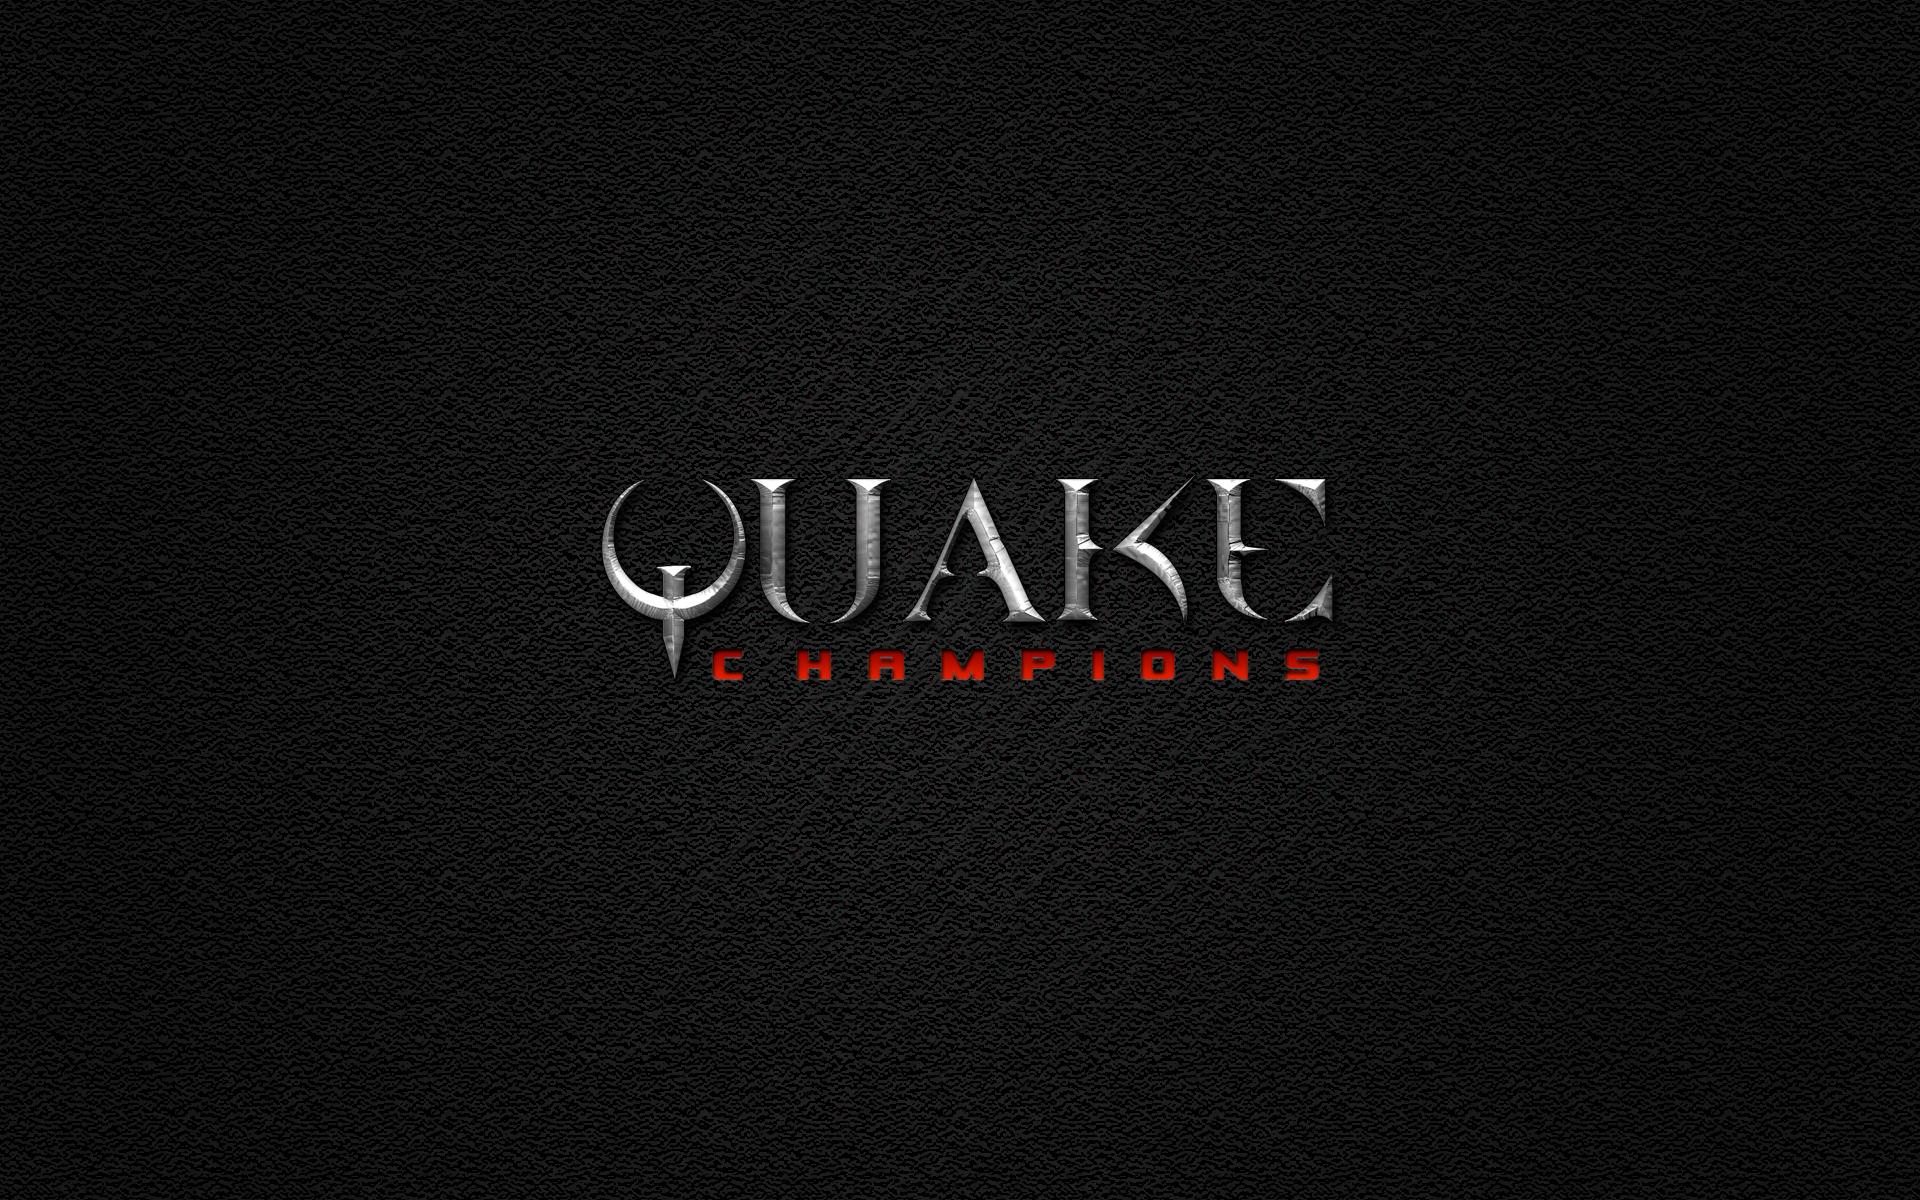 quake_champions_by_mullet-db5c6a8.jpg